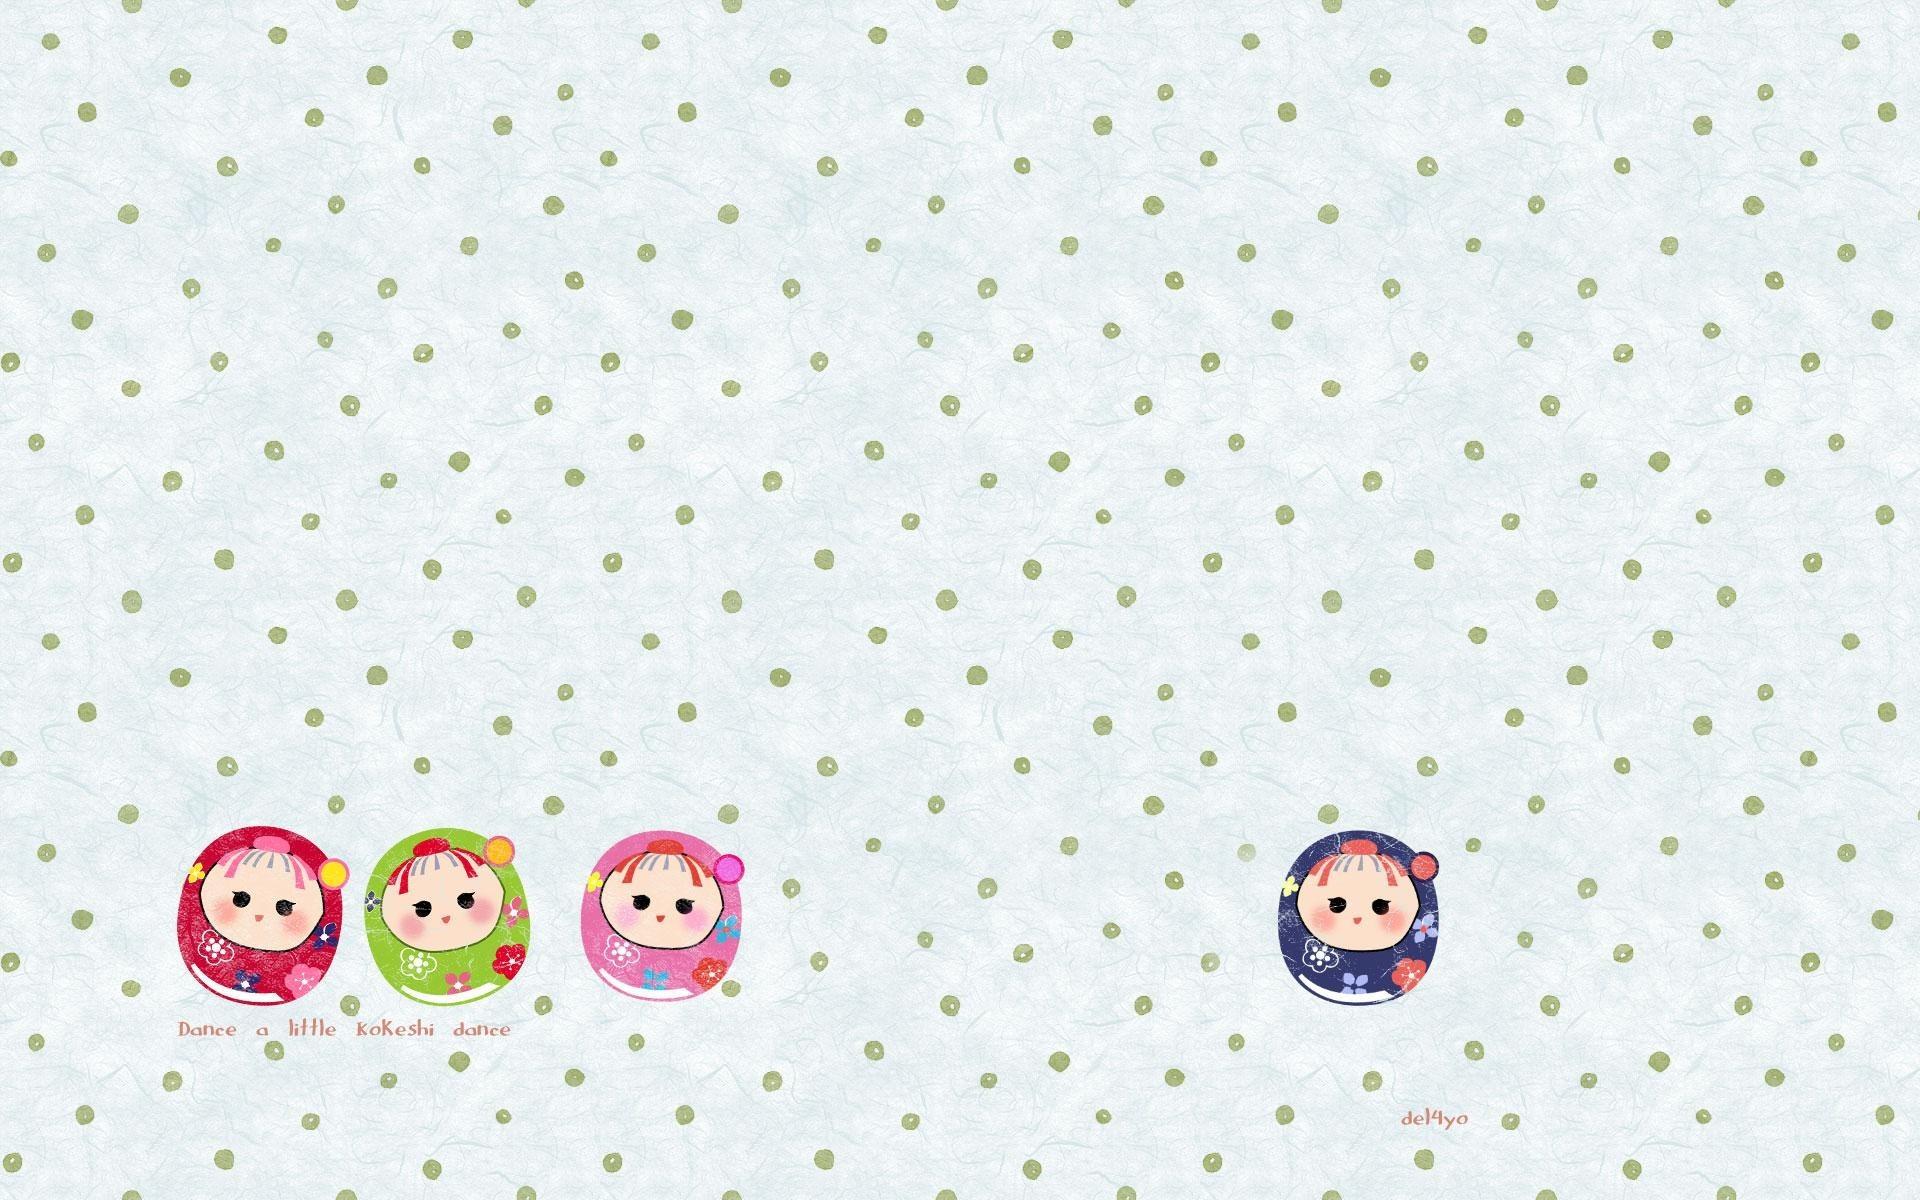 Cute Japanese Background 183 ①